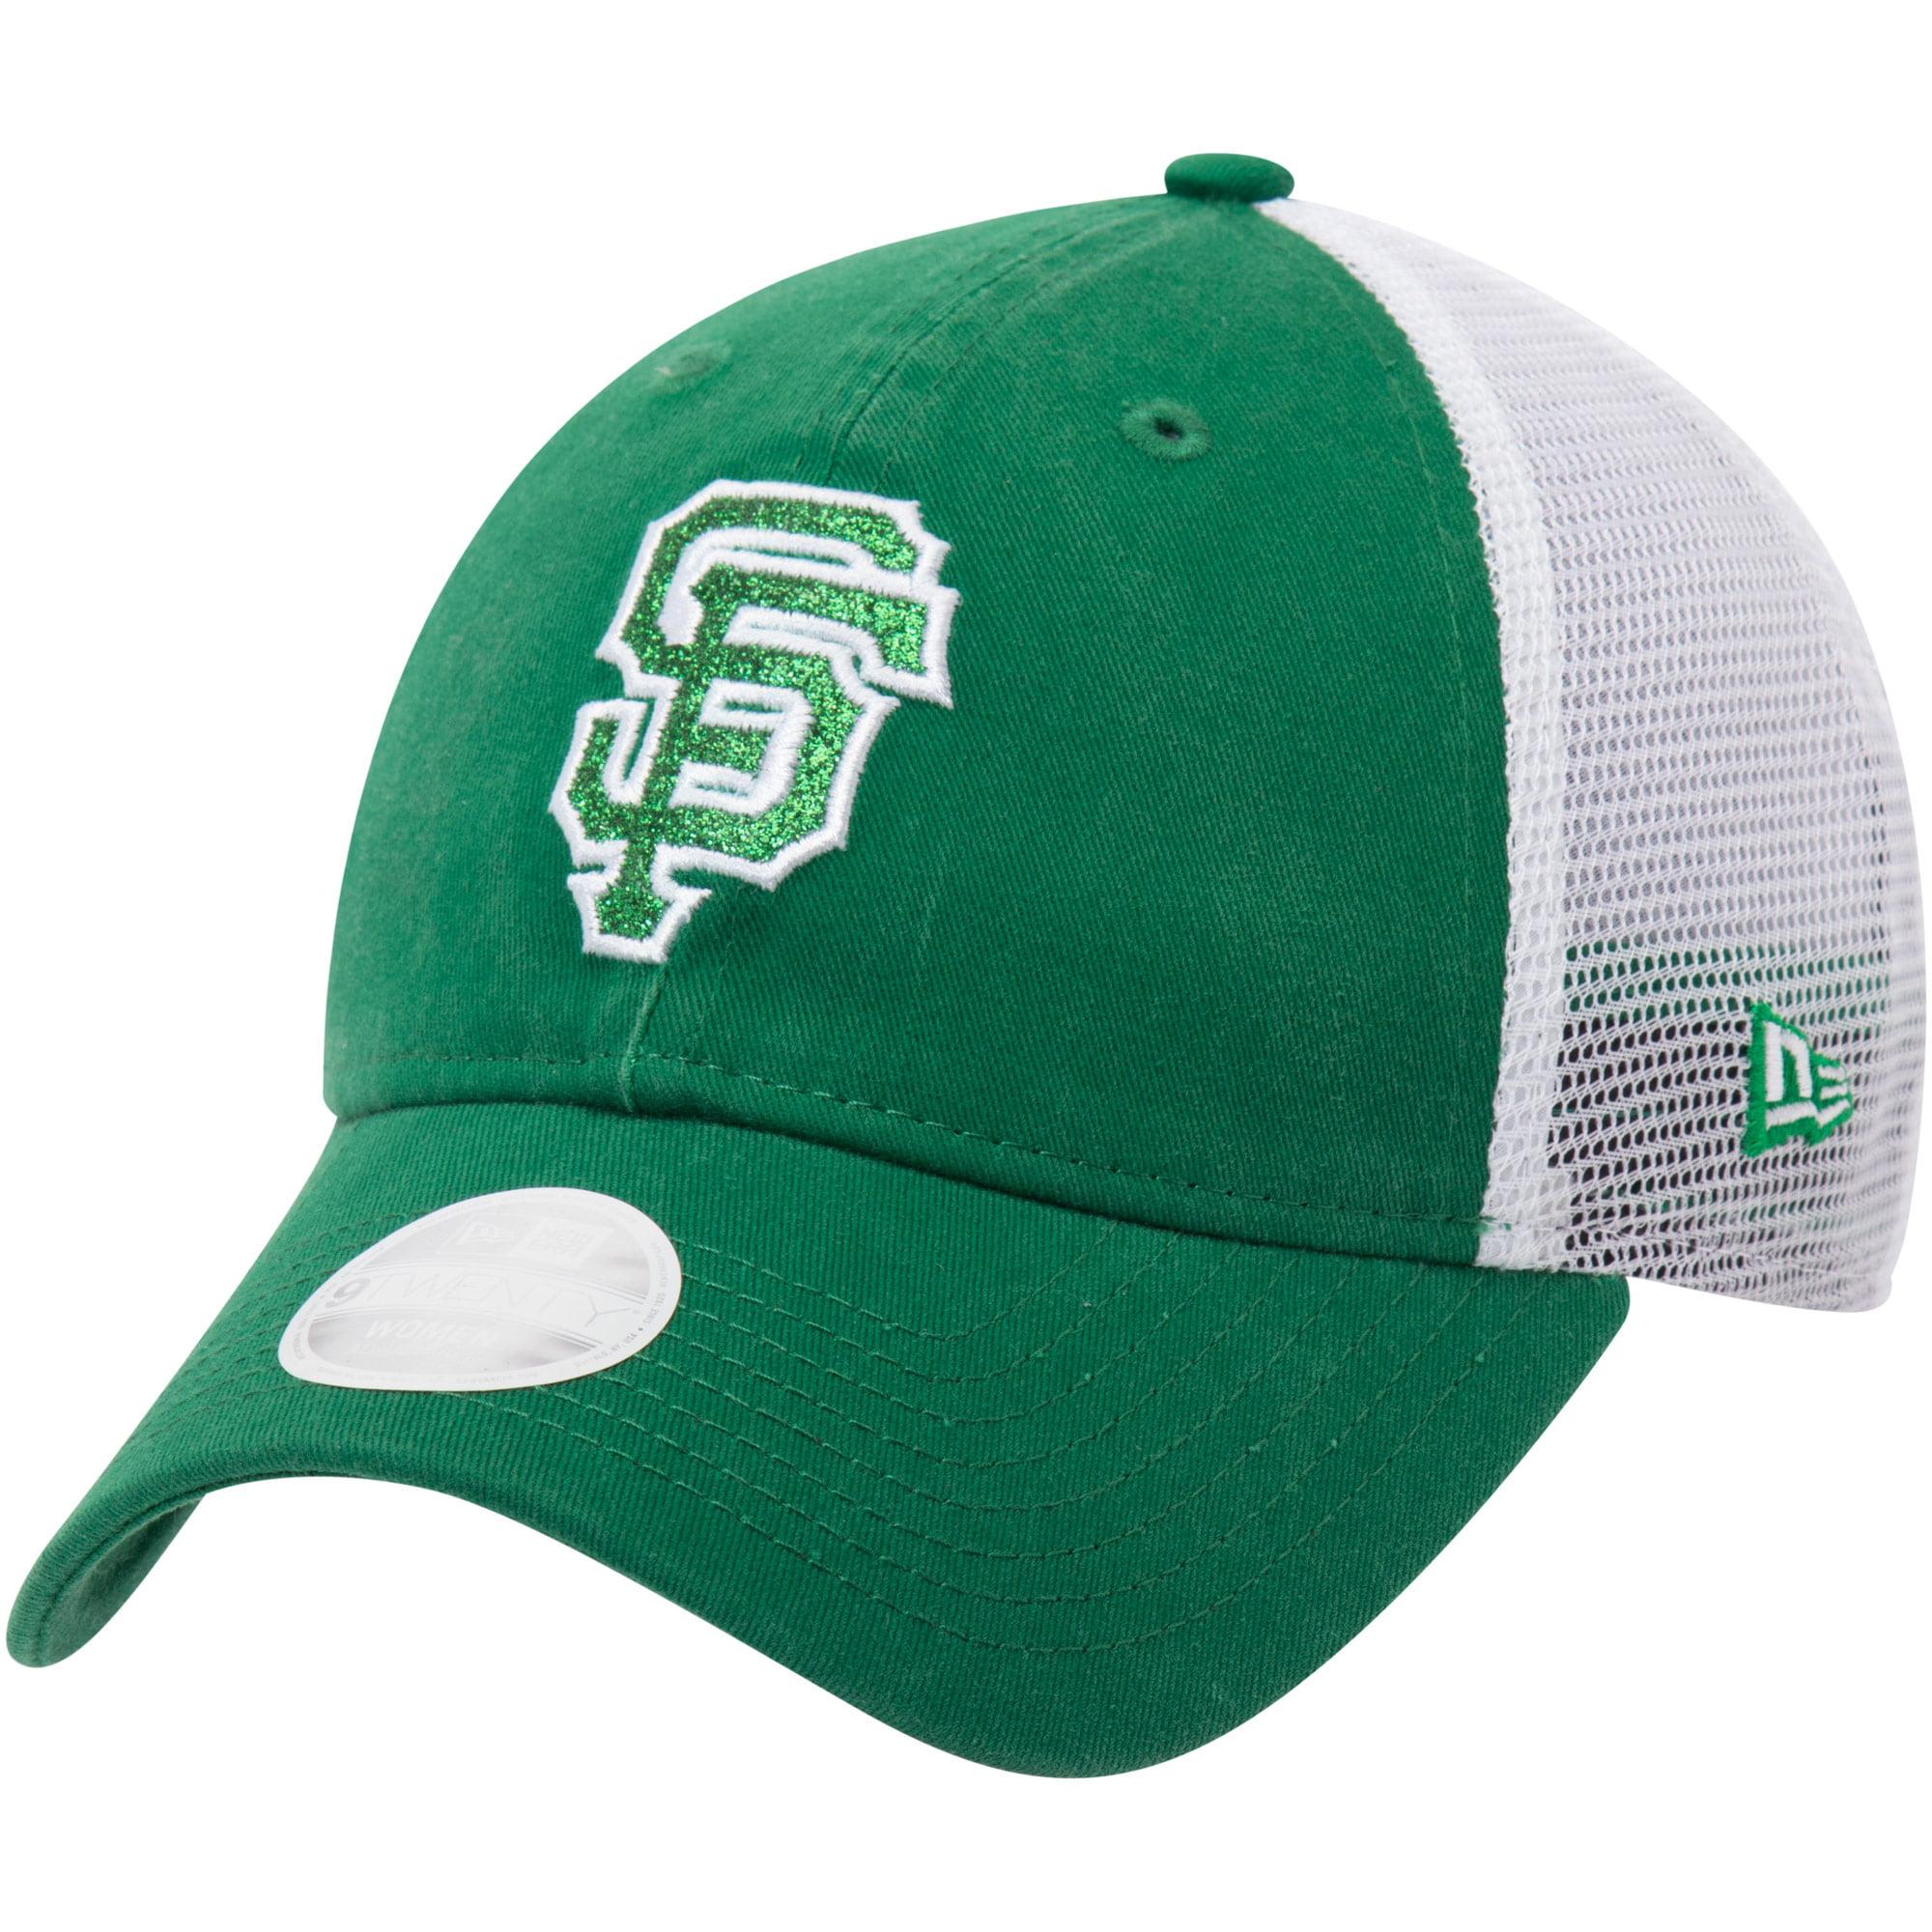 San Francisco Giants New Era Women's Trucker Shine St. Patrick's Day 9TWENTY Adjustable Hat - Green - OSFA